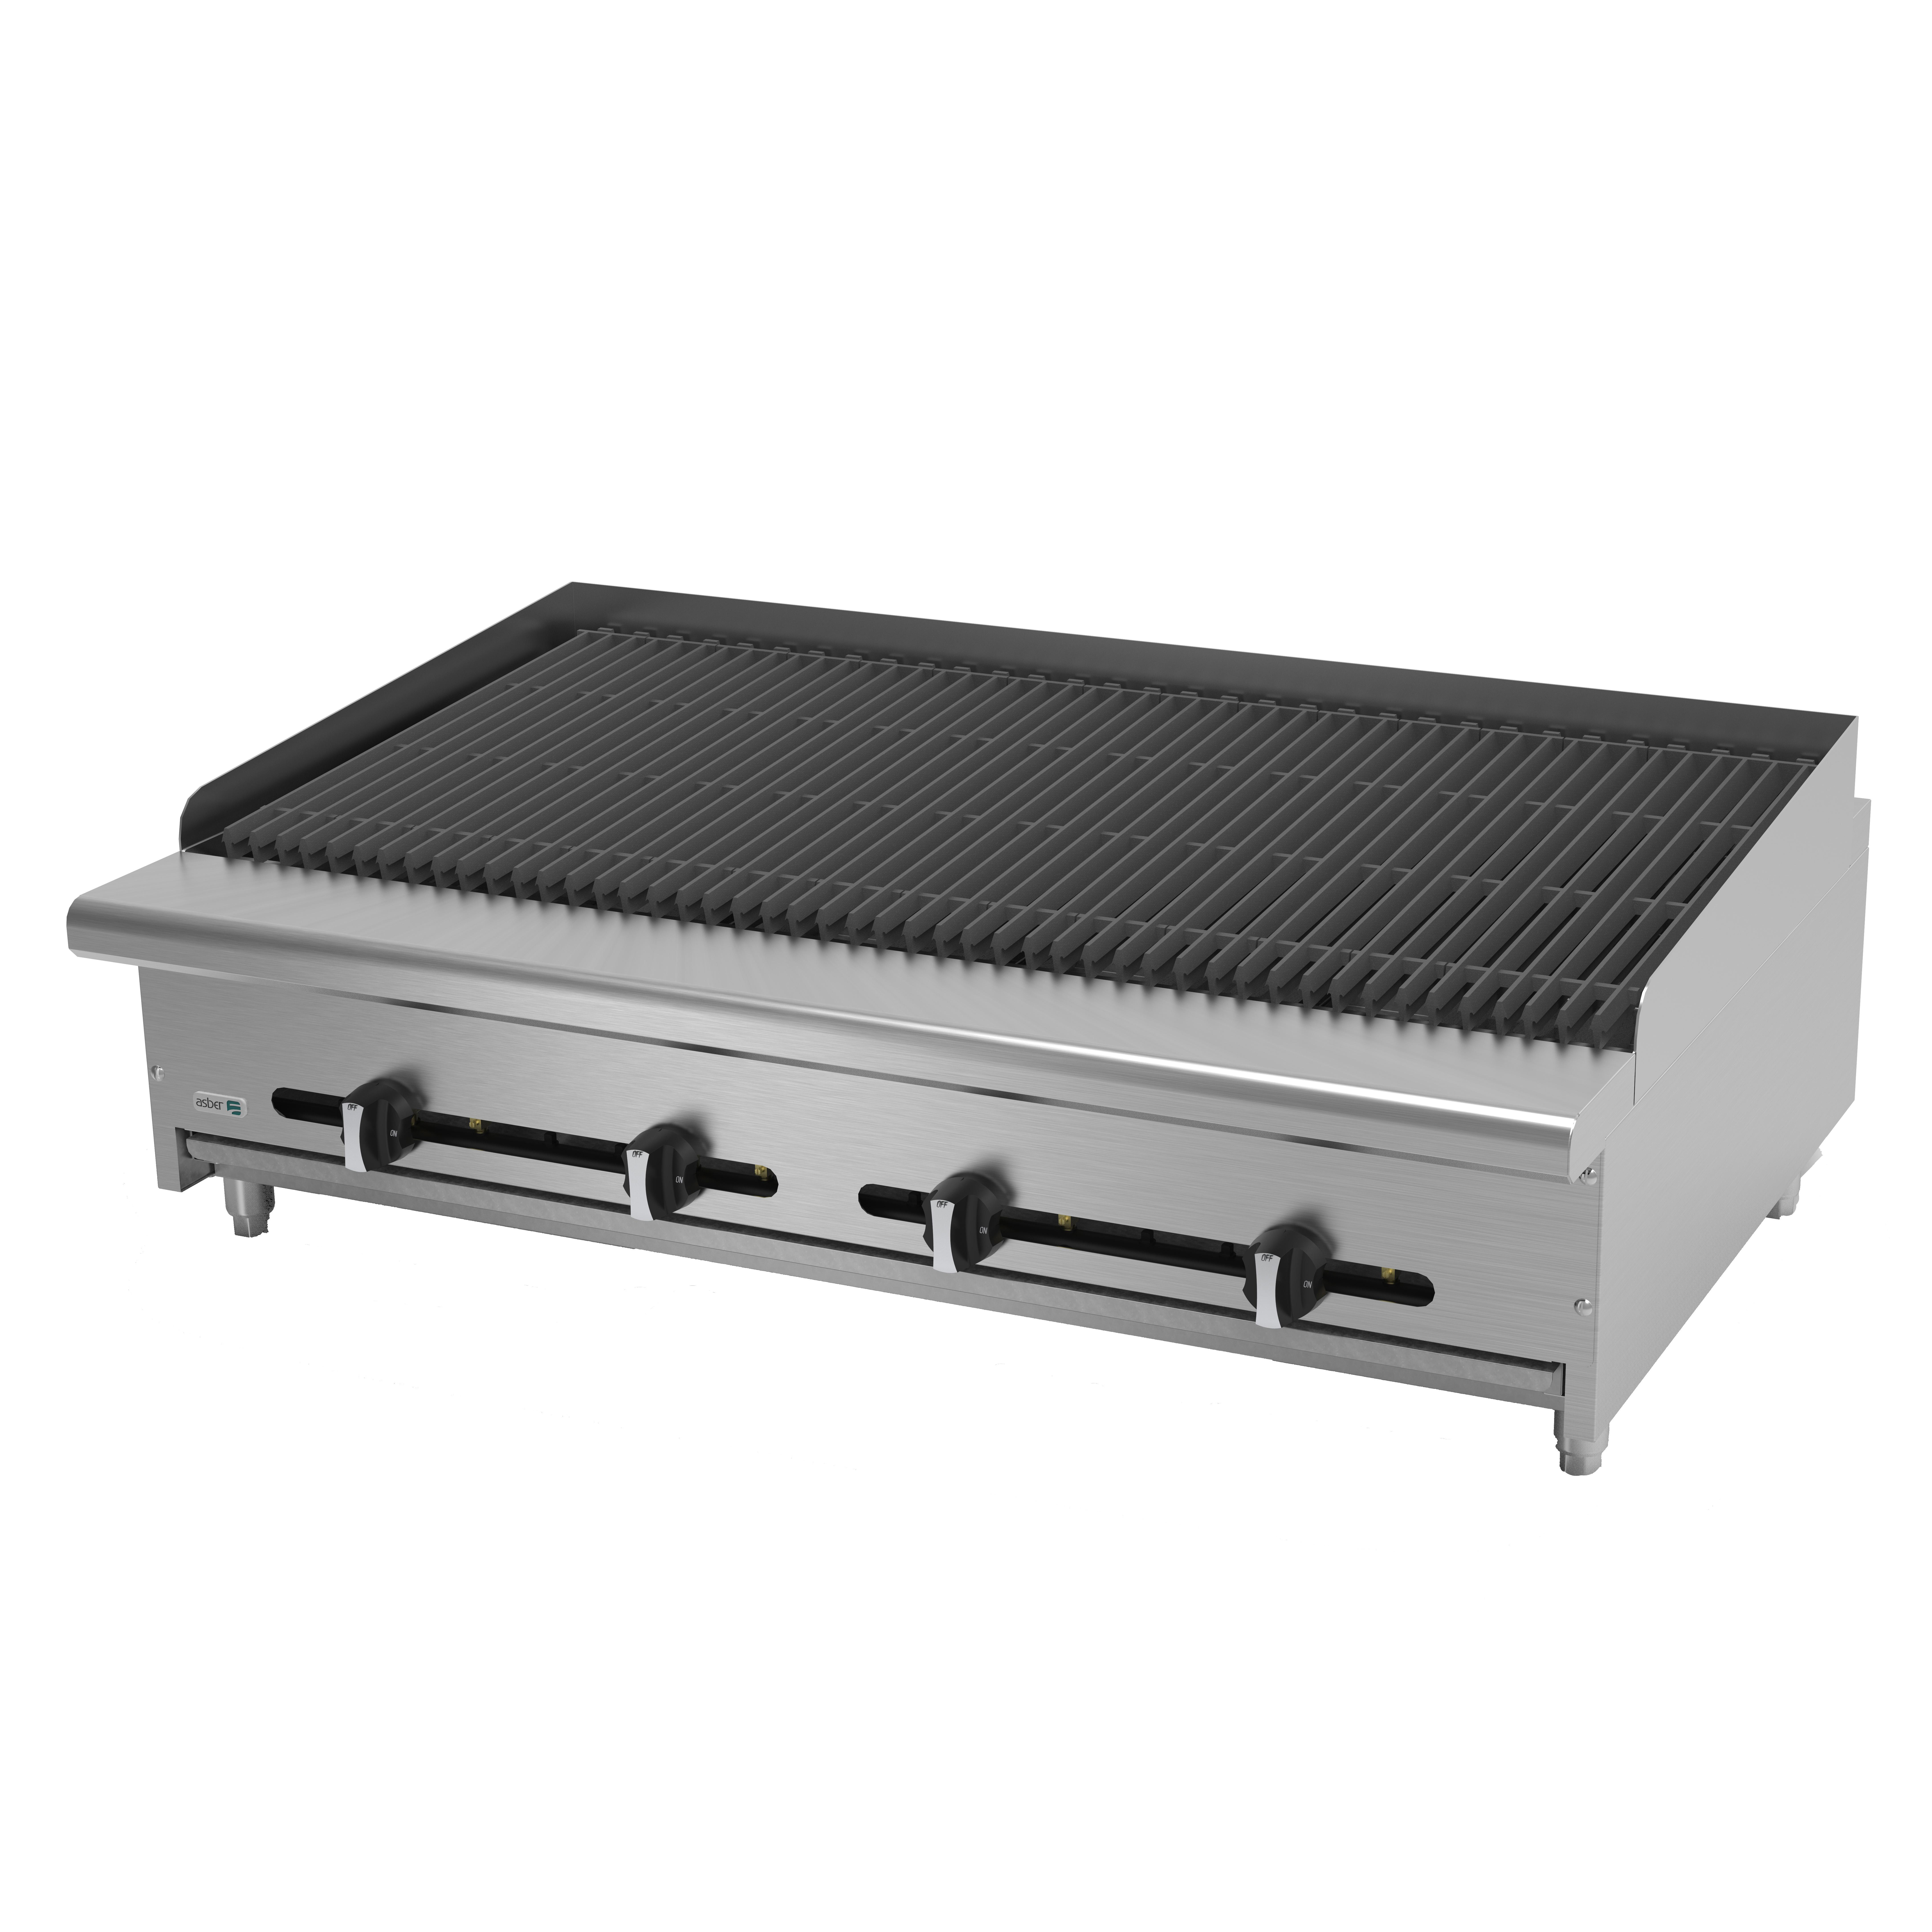 Asber AERB-48 charbroiler, gas, countertop